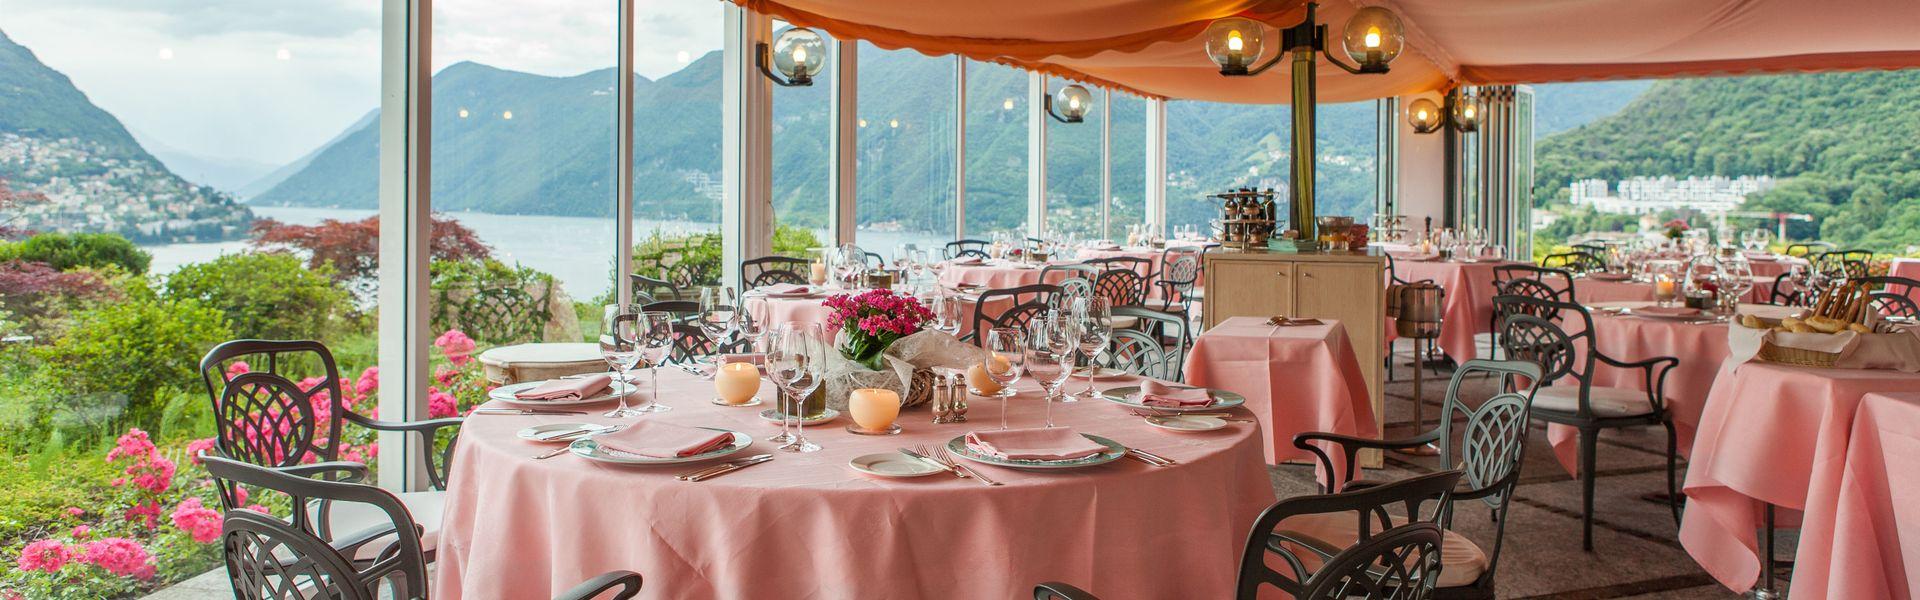 Villa Principe Leopoldo Lugano Switzerland Updated 2020 Official Website Of Jp Moser